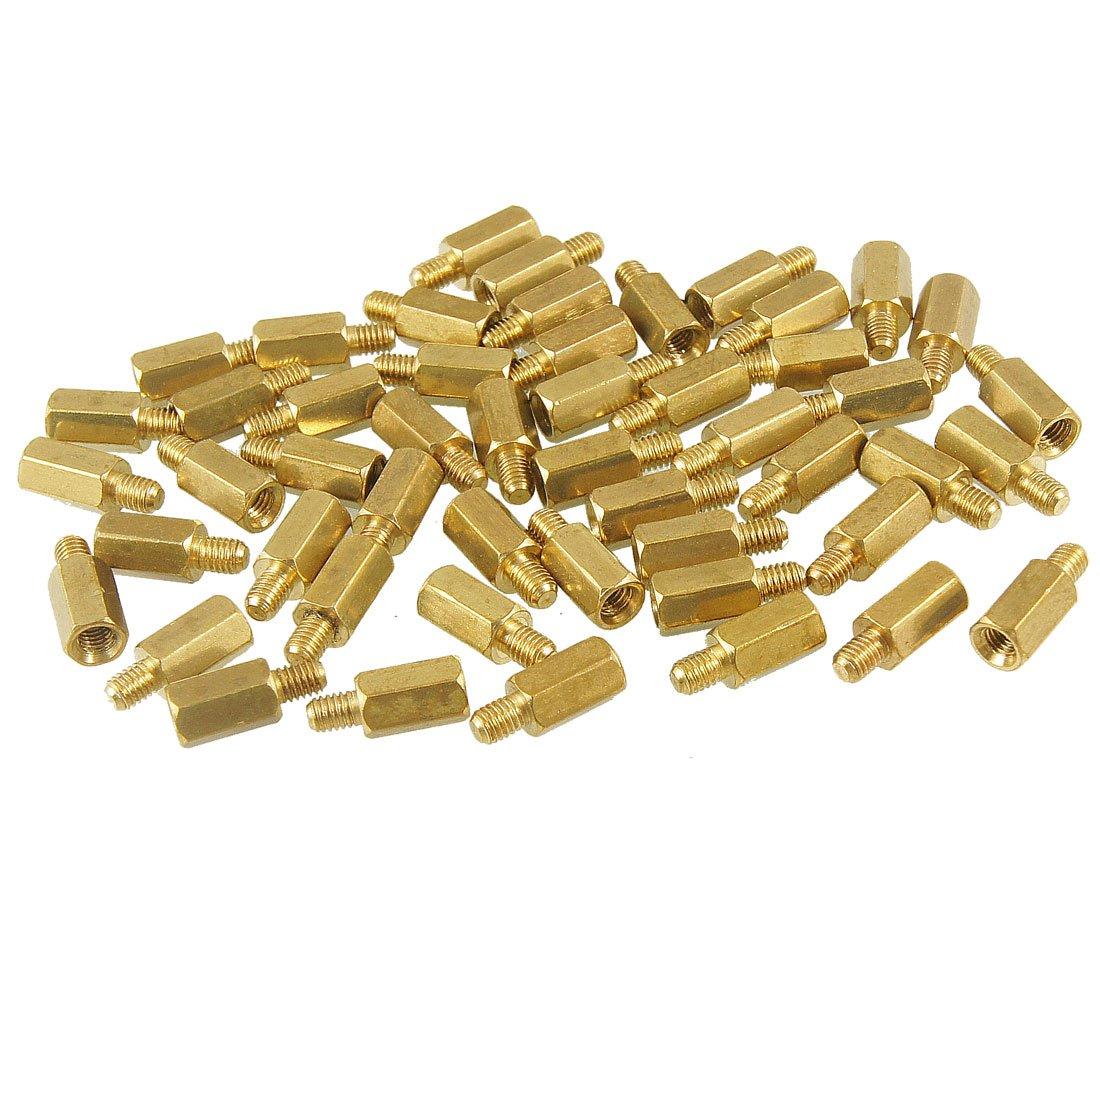 CLOS M3 Male x M3 Female 8mm Long Hexagonal Brass PCB Standoffs Spacers 50 Pcs thgs 50 pcs brass screw hexagonal stand off spacer m3 male x m3 female 12mm body length